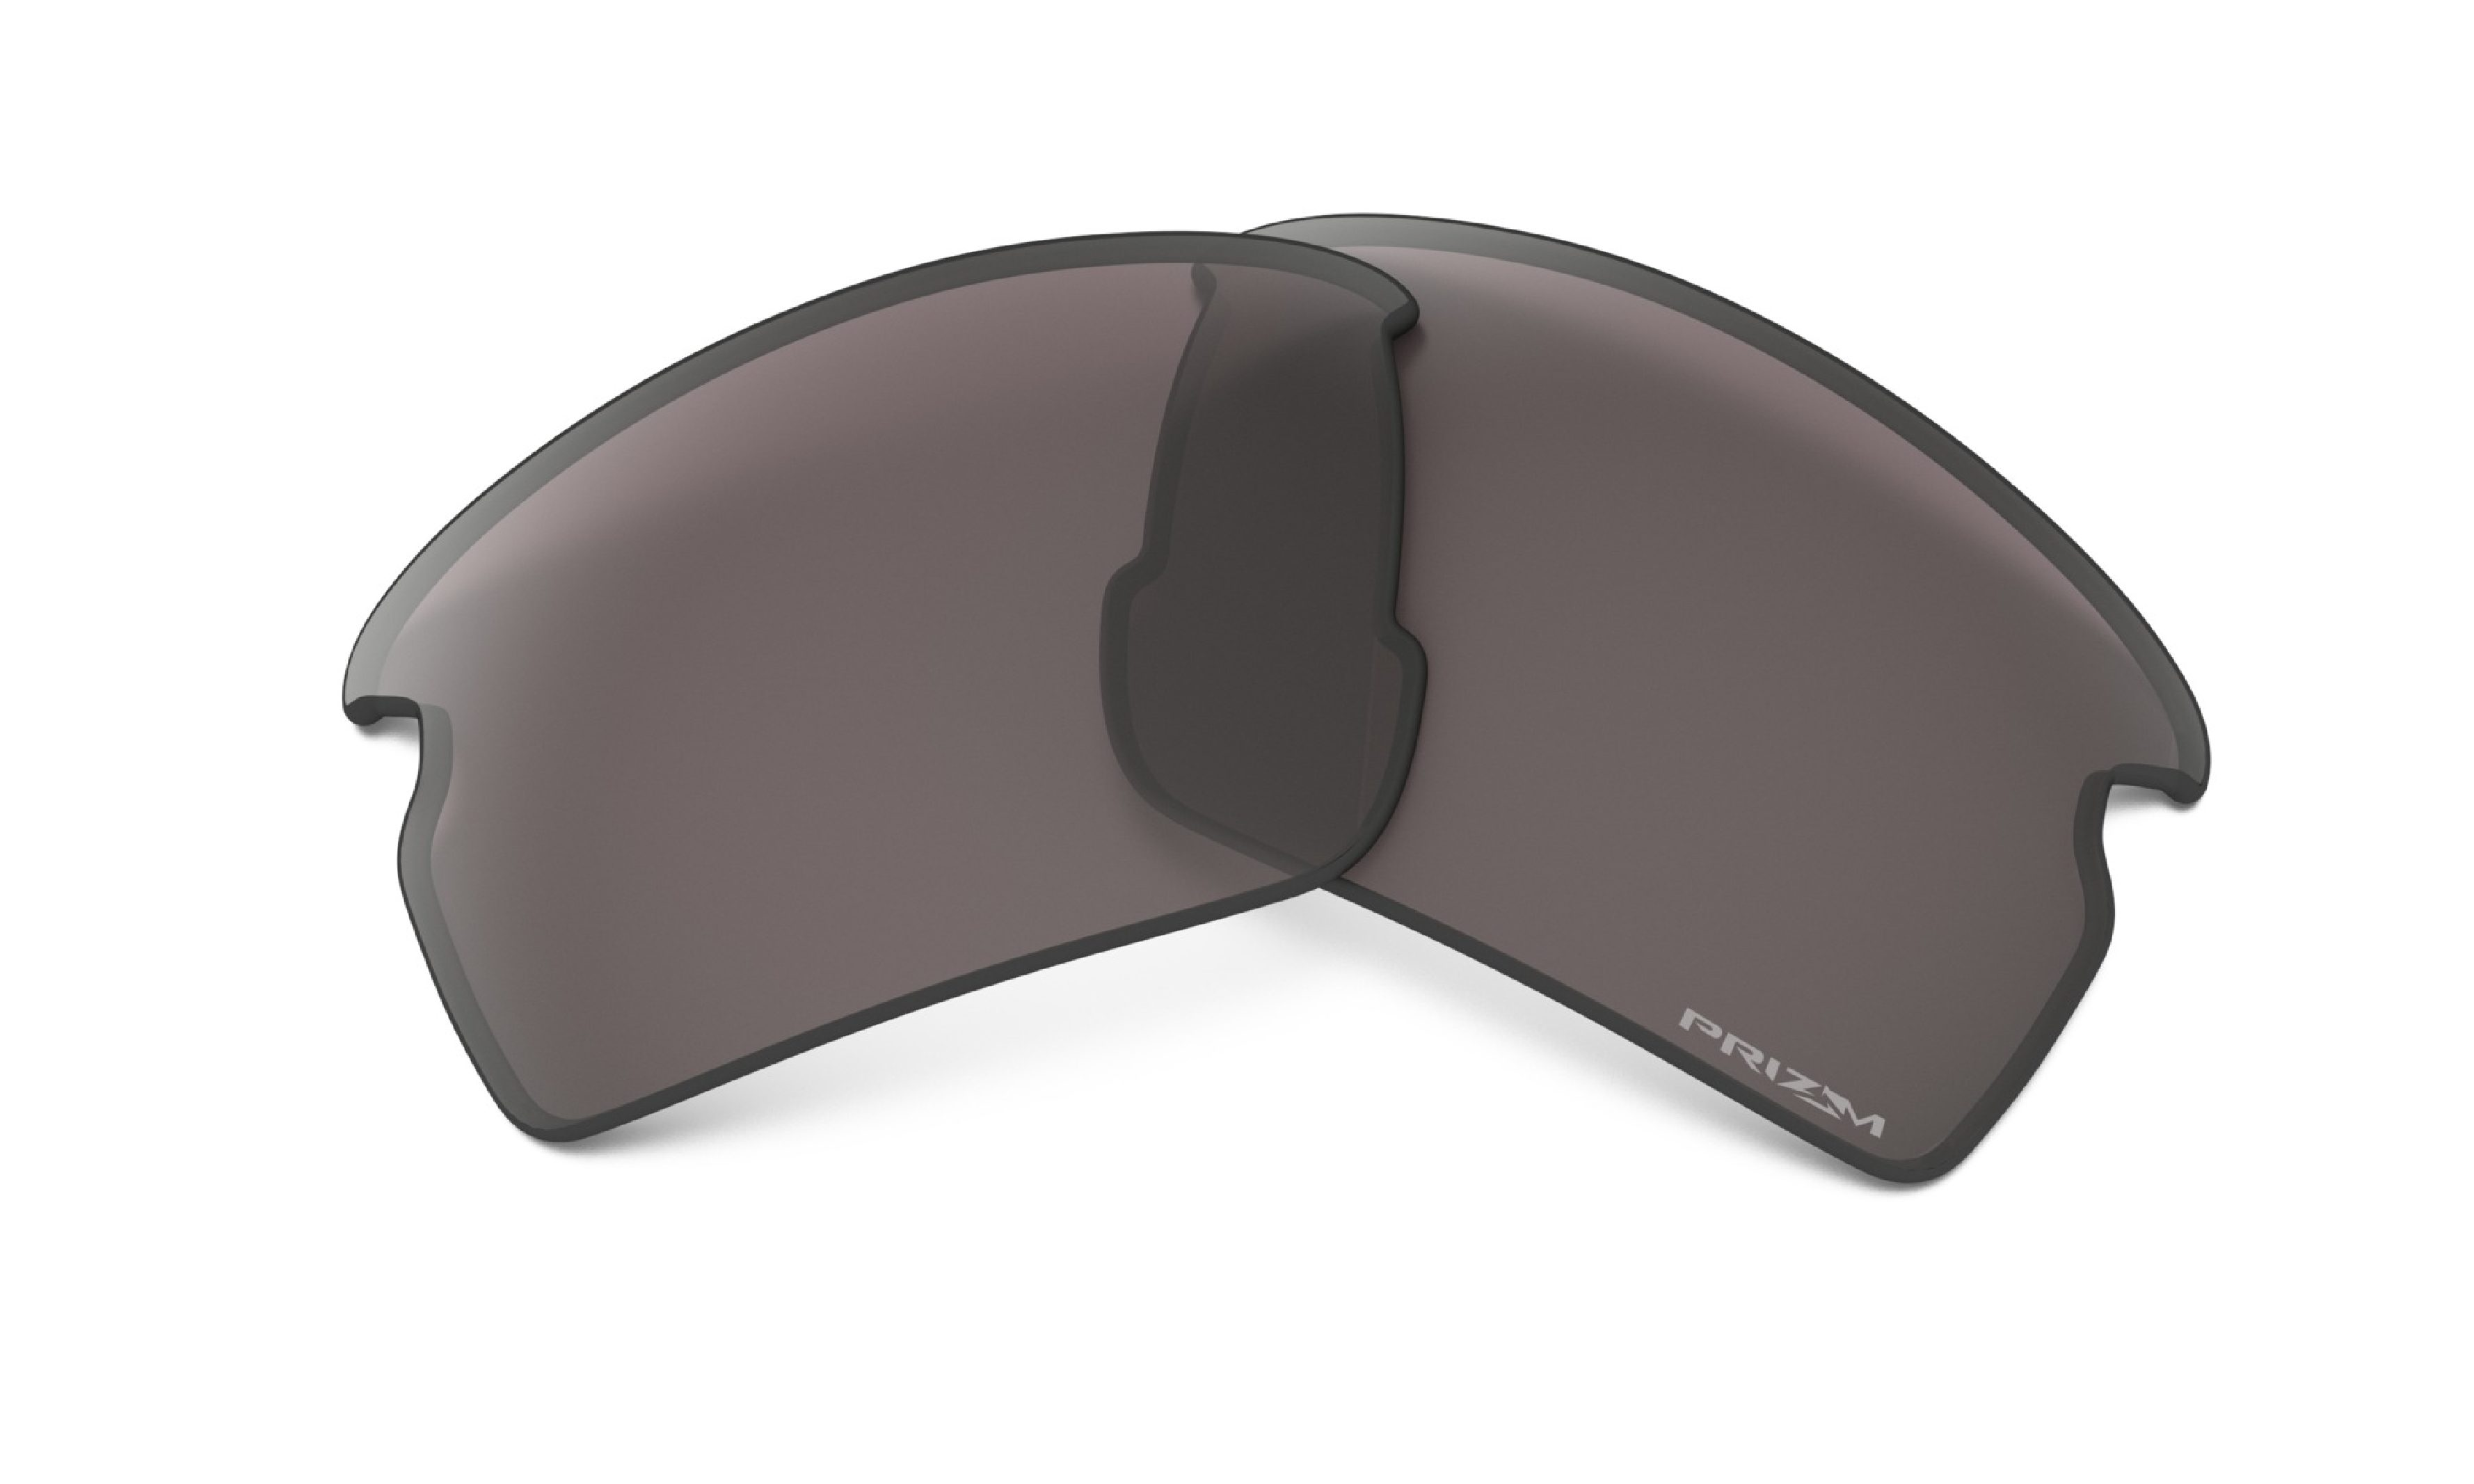 NUR GLÄSER für Modell 9188: Flak 2.0 XL / Glasfarbe: Prizm Daily Polarized